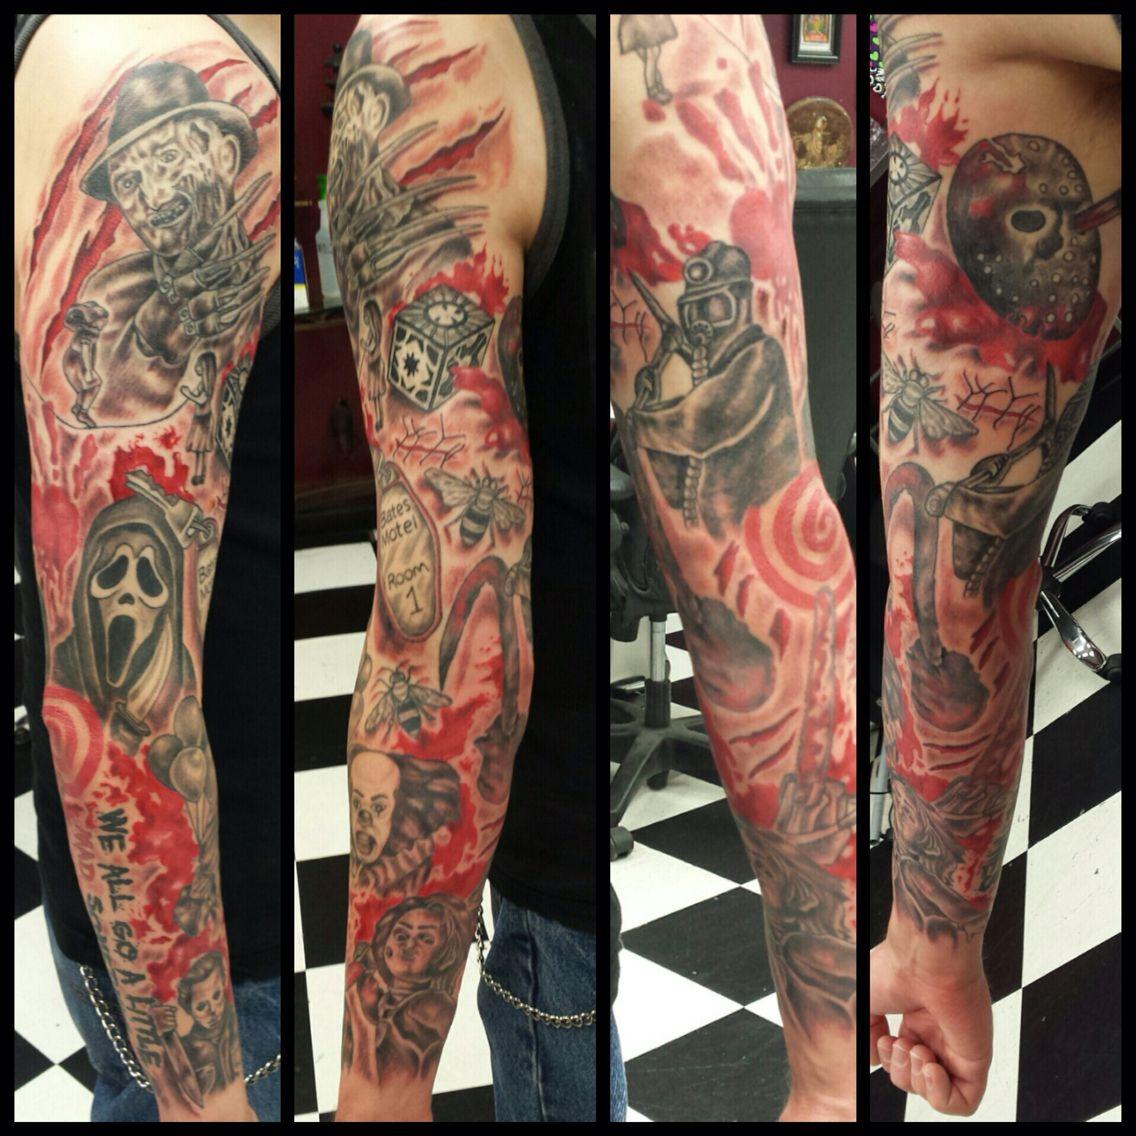 3b1adaeb8 Slasher Sleeve by tattoojax It's finished!!! ❤ Nightmare On Elm Street -